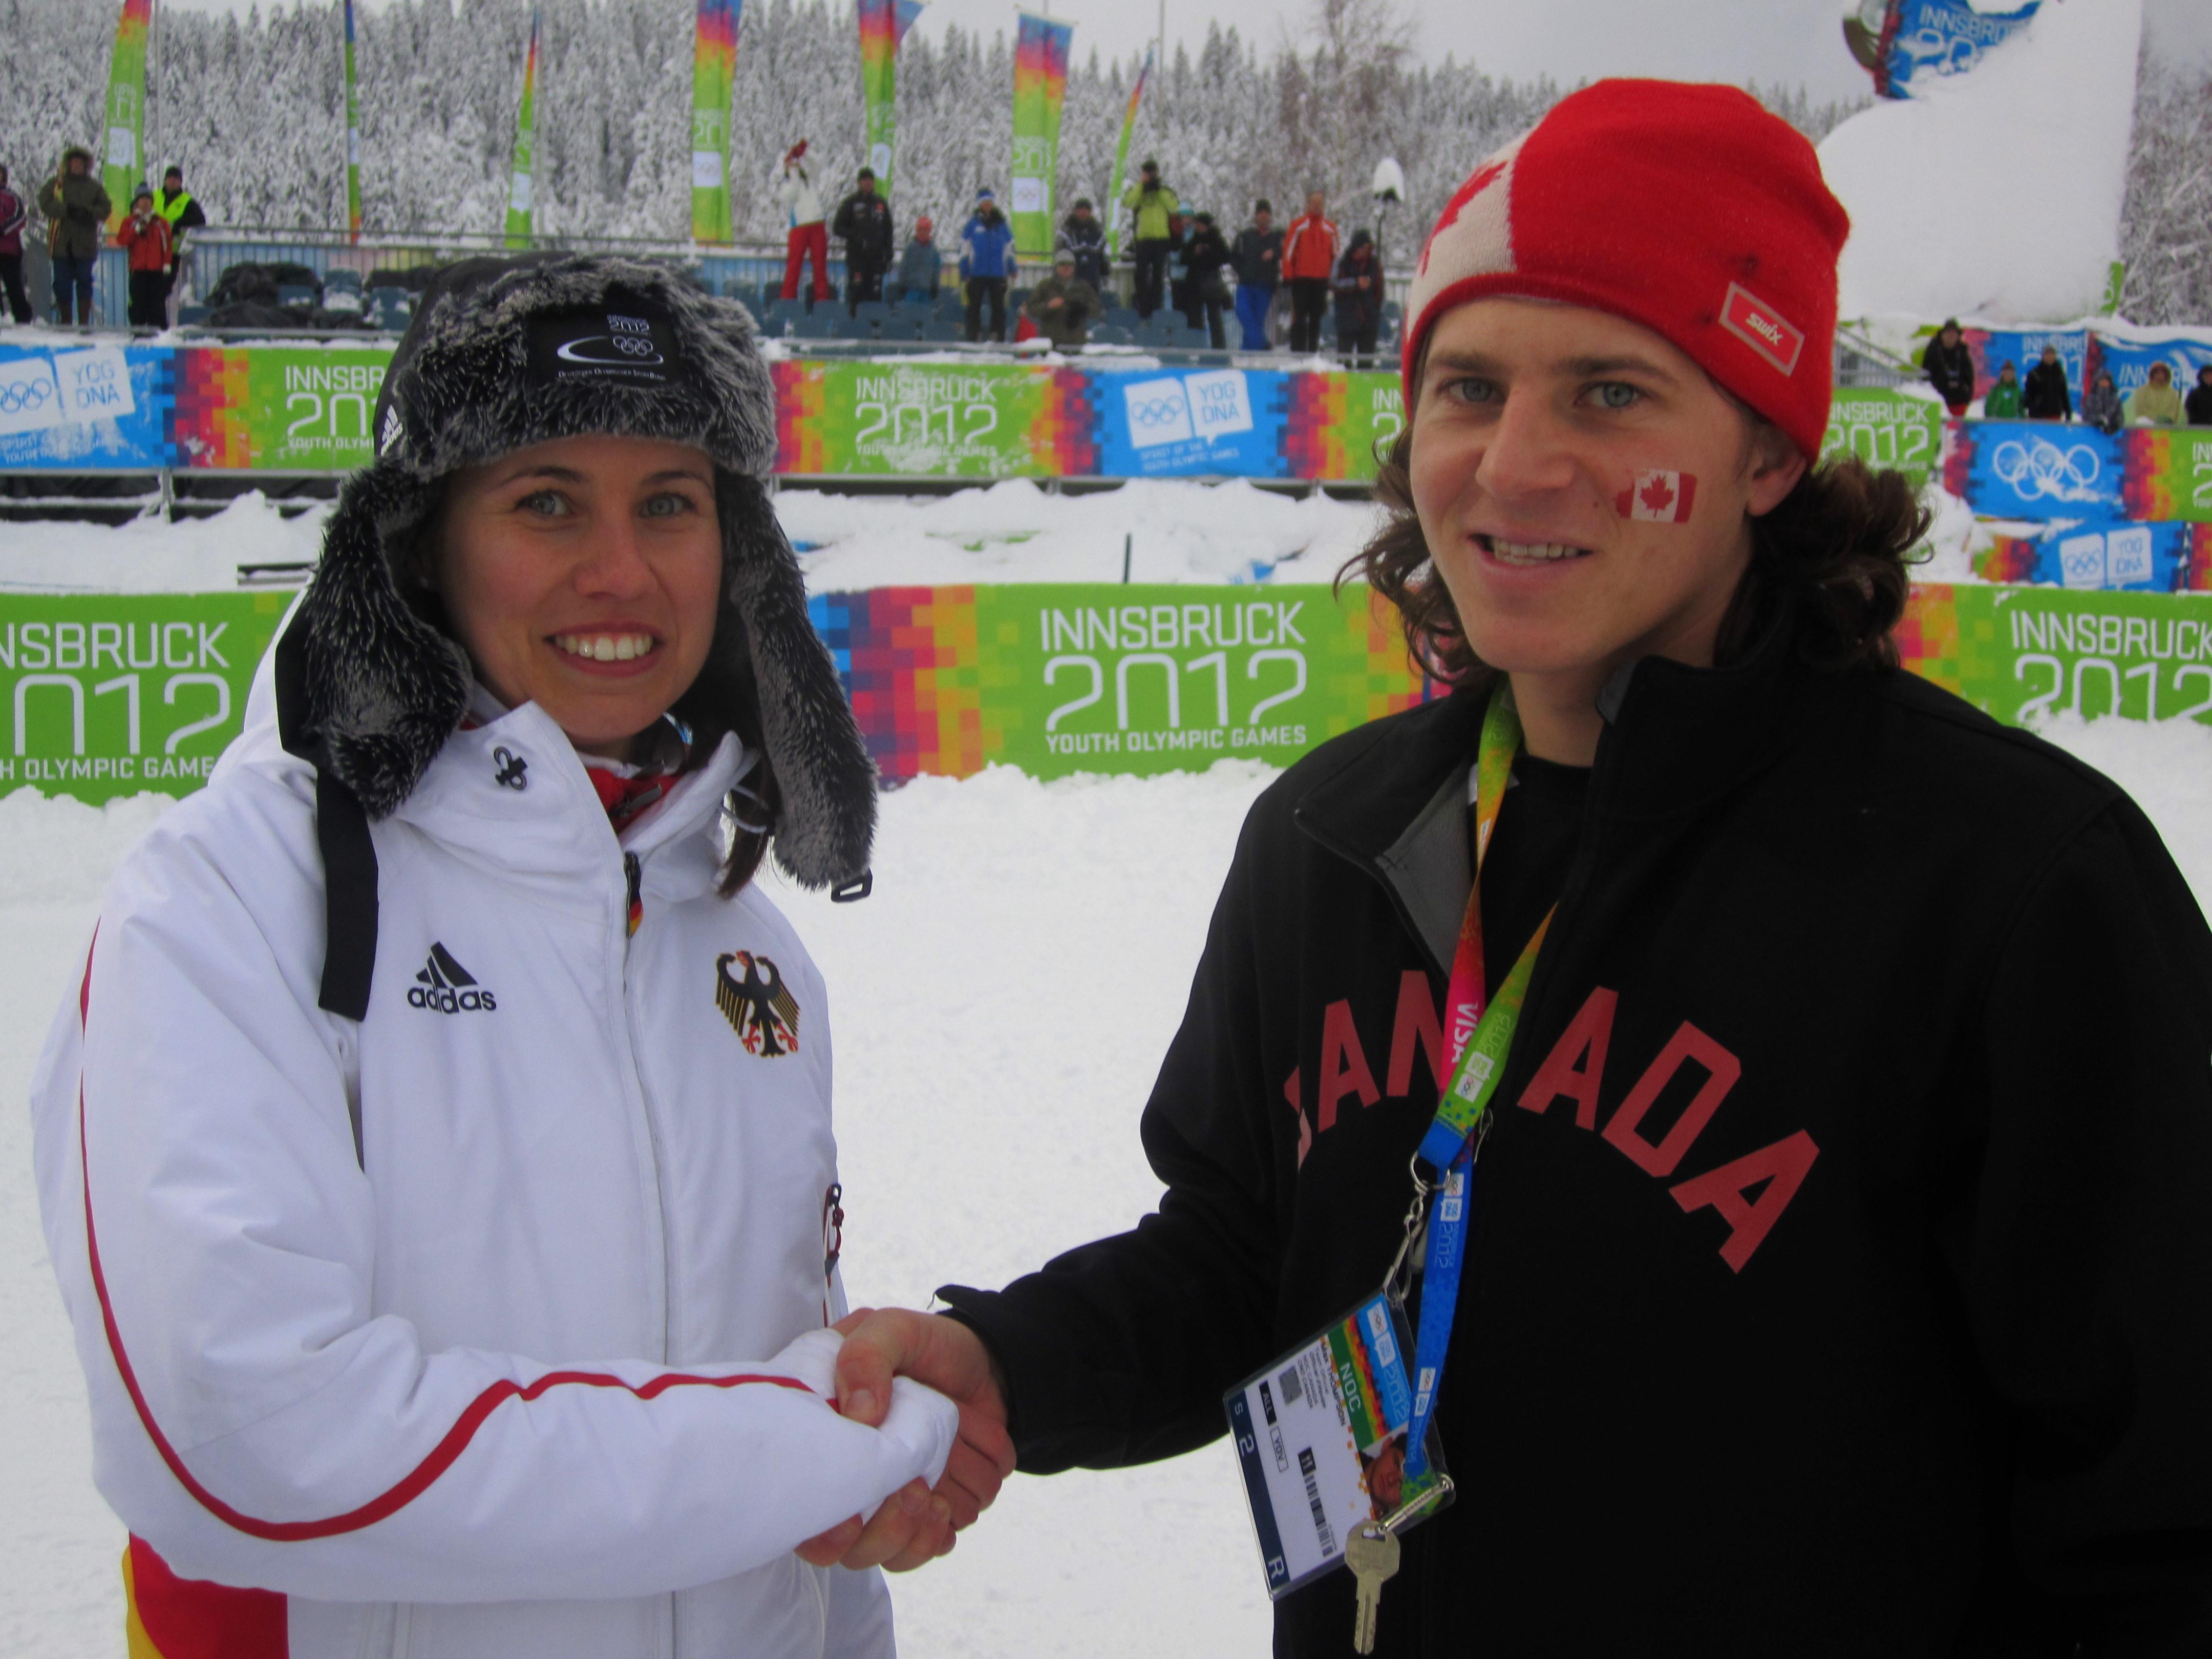 https://fasterskier.com/wp-content/blogs.dir/1/files/2012/01/Canada-HANDSHAKE.jpg